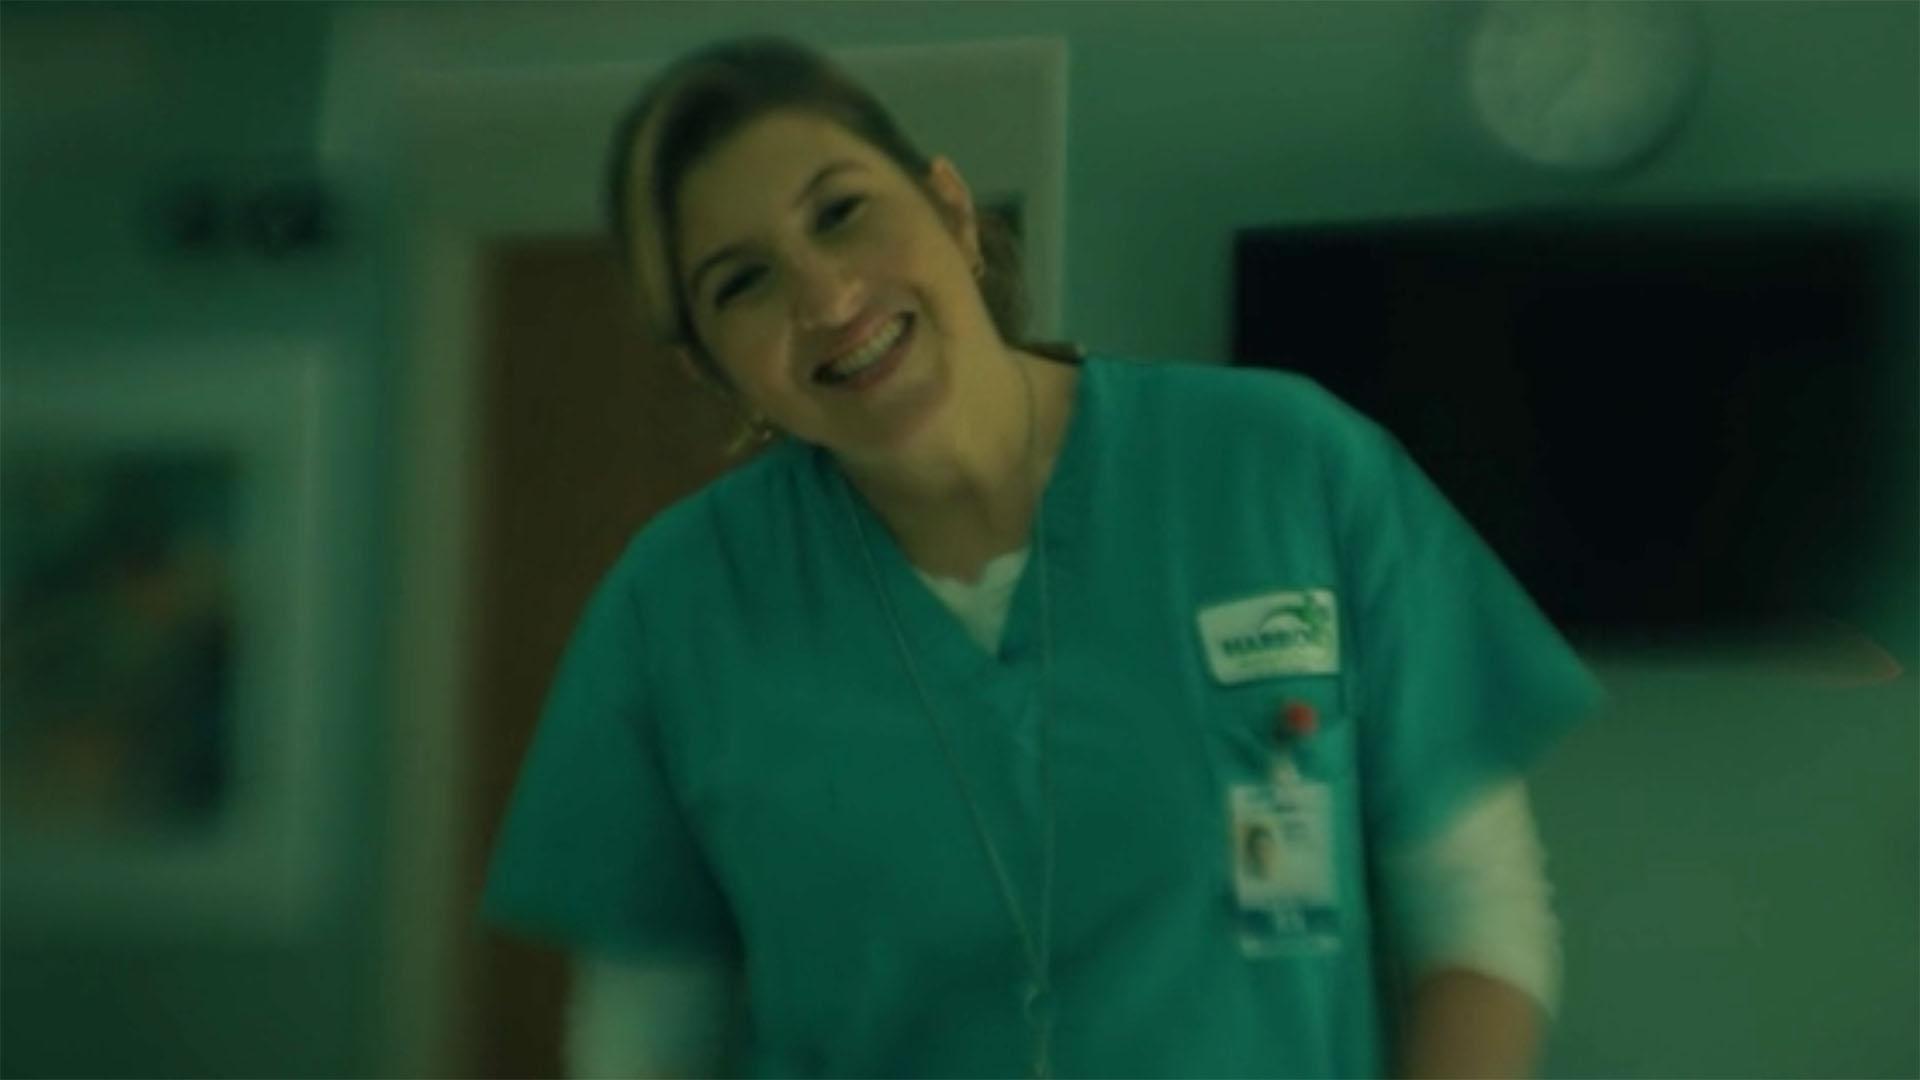 Tara Summers as Nurse Linda Bloch